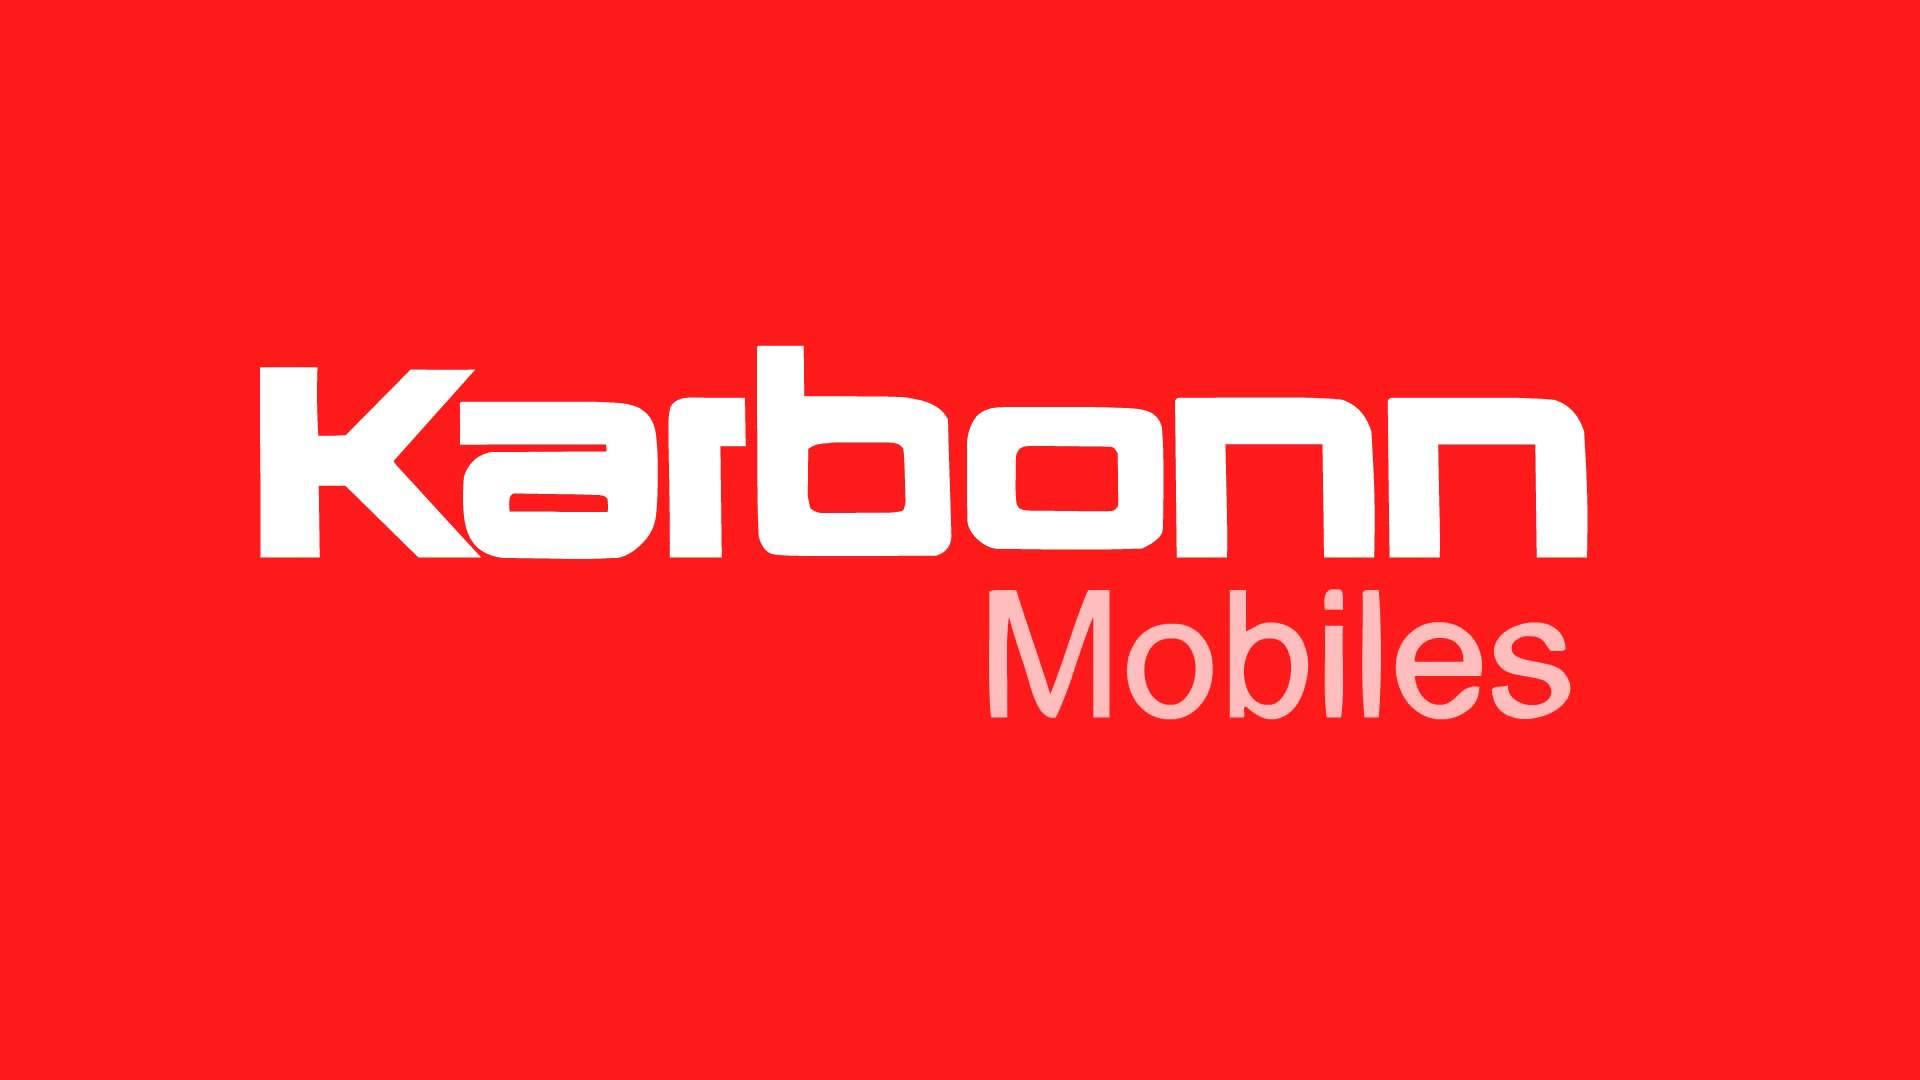 Logo Karbonn mobiles rojo y blanco